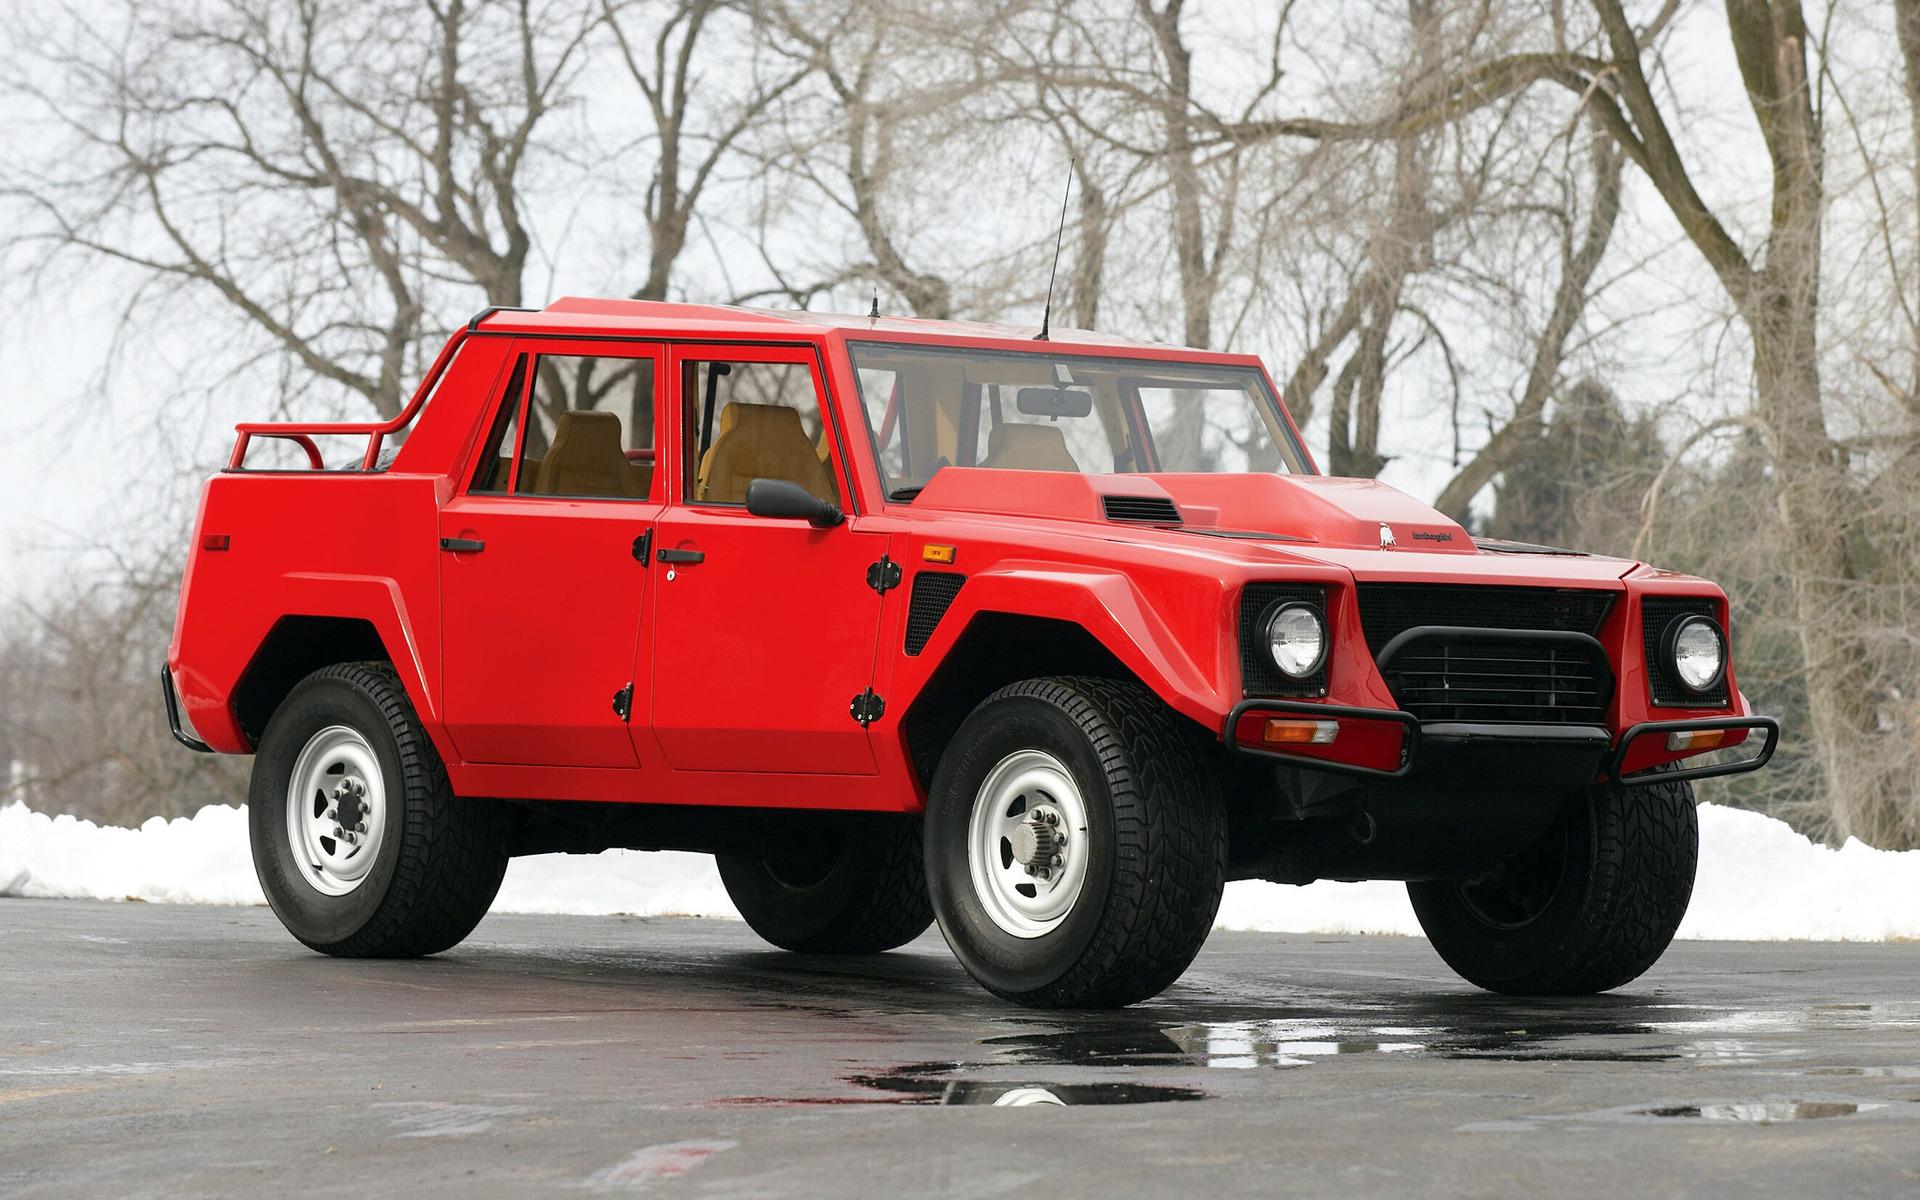 Badass Trucks & Cool SUVs - lm002